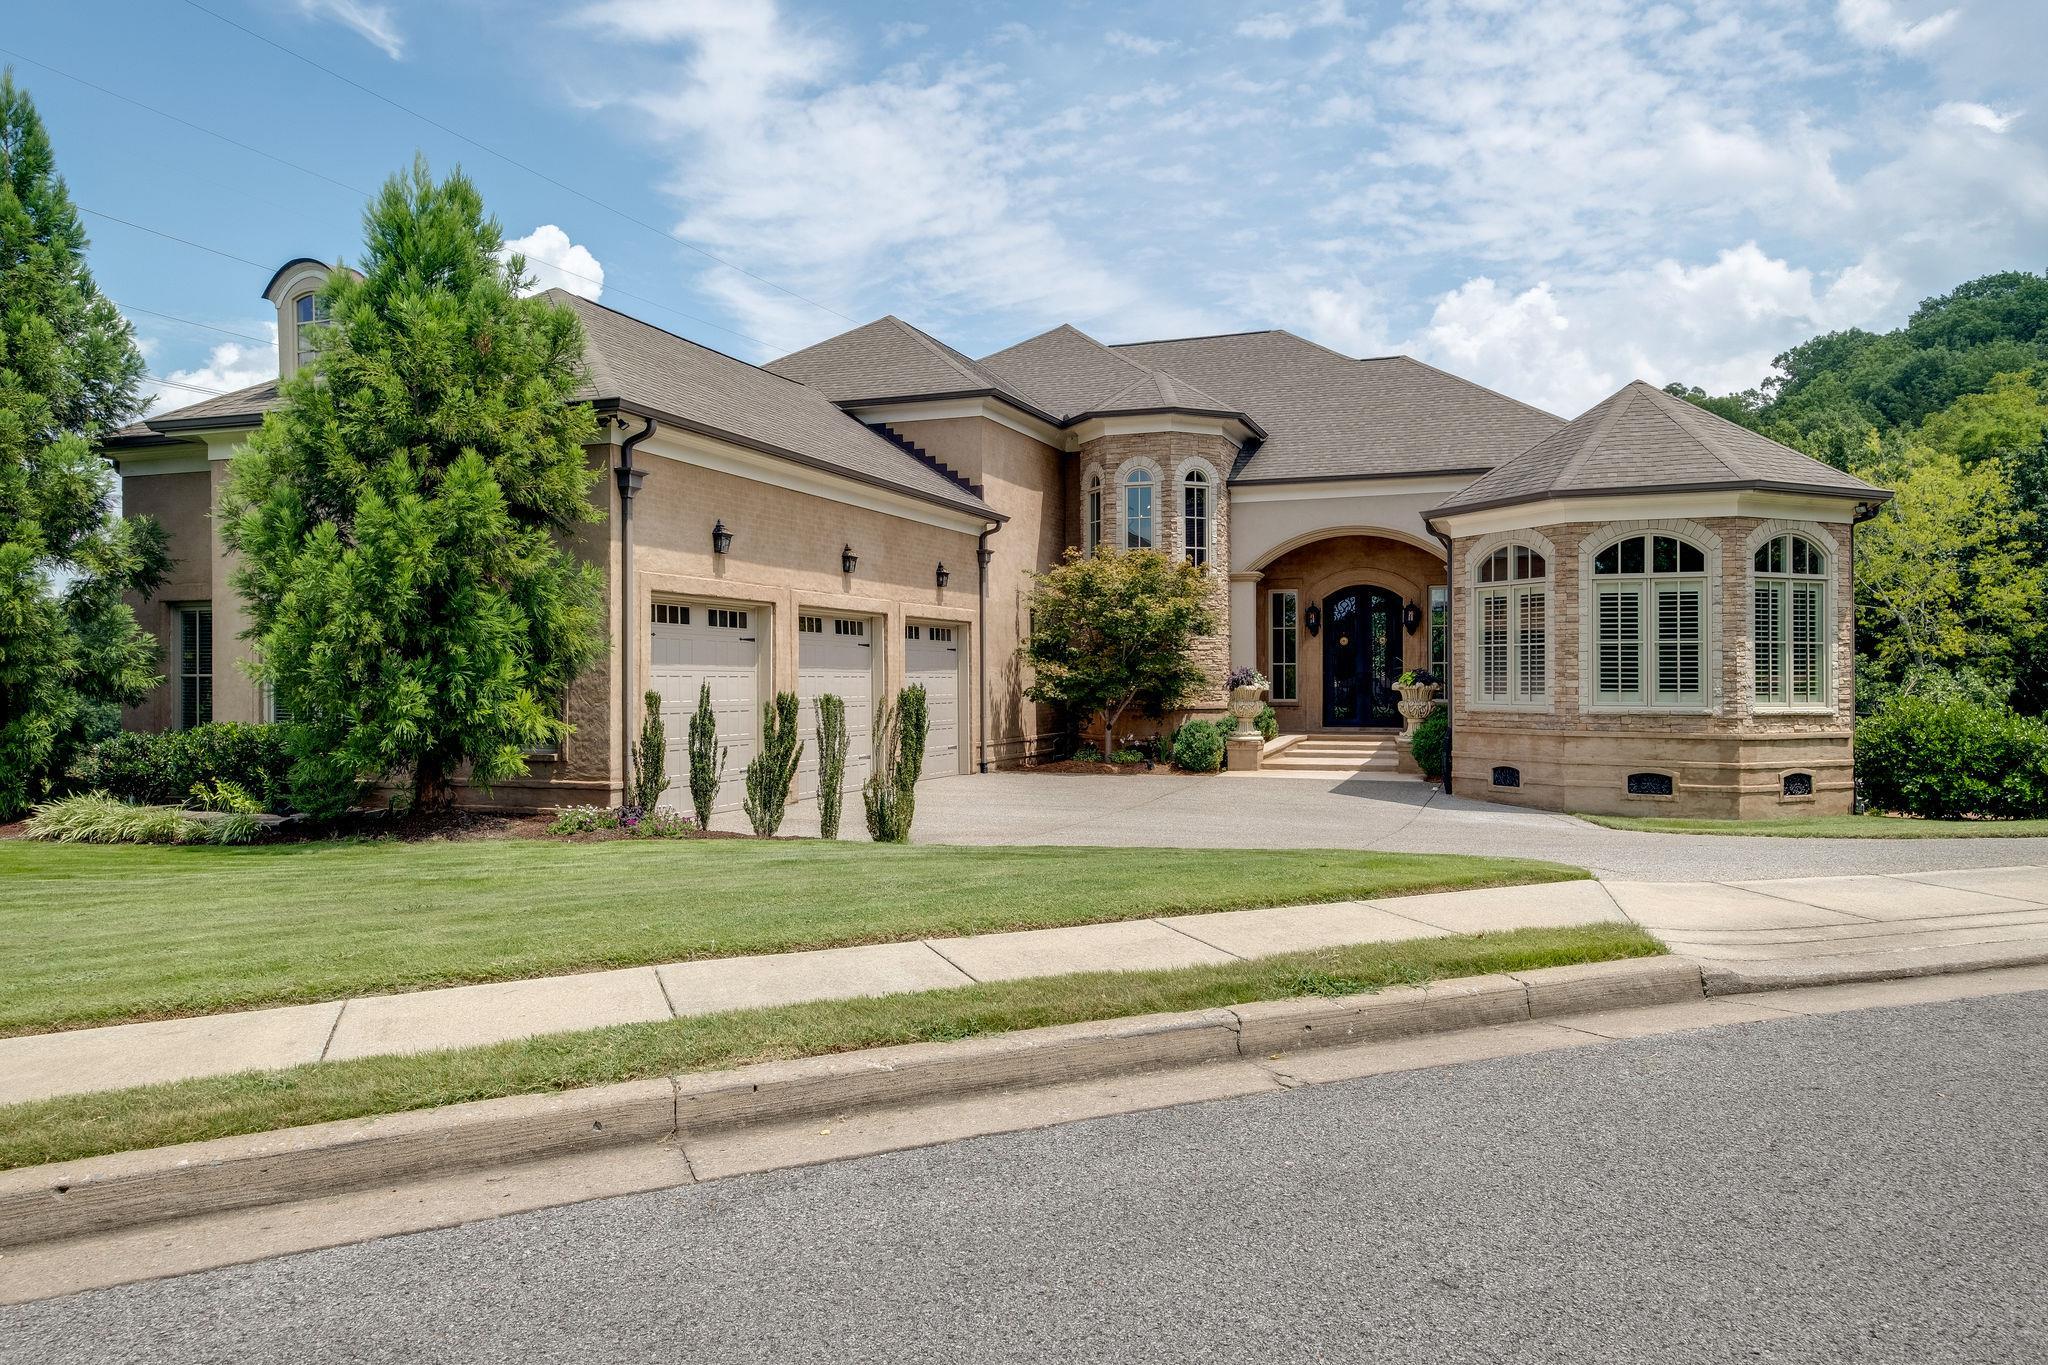 1140 Stonebridge Park Dr, Franklin, TN 37069 - Franklin, TN real estate listing